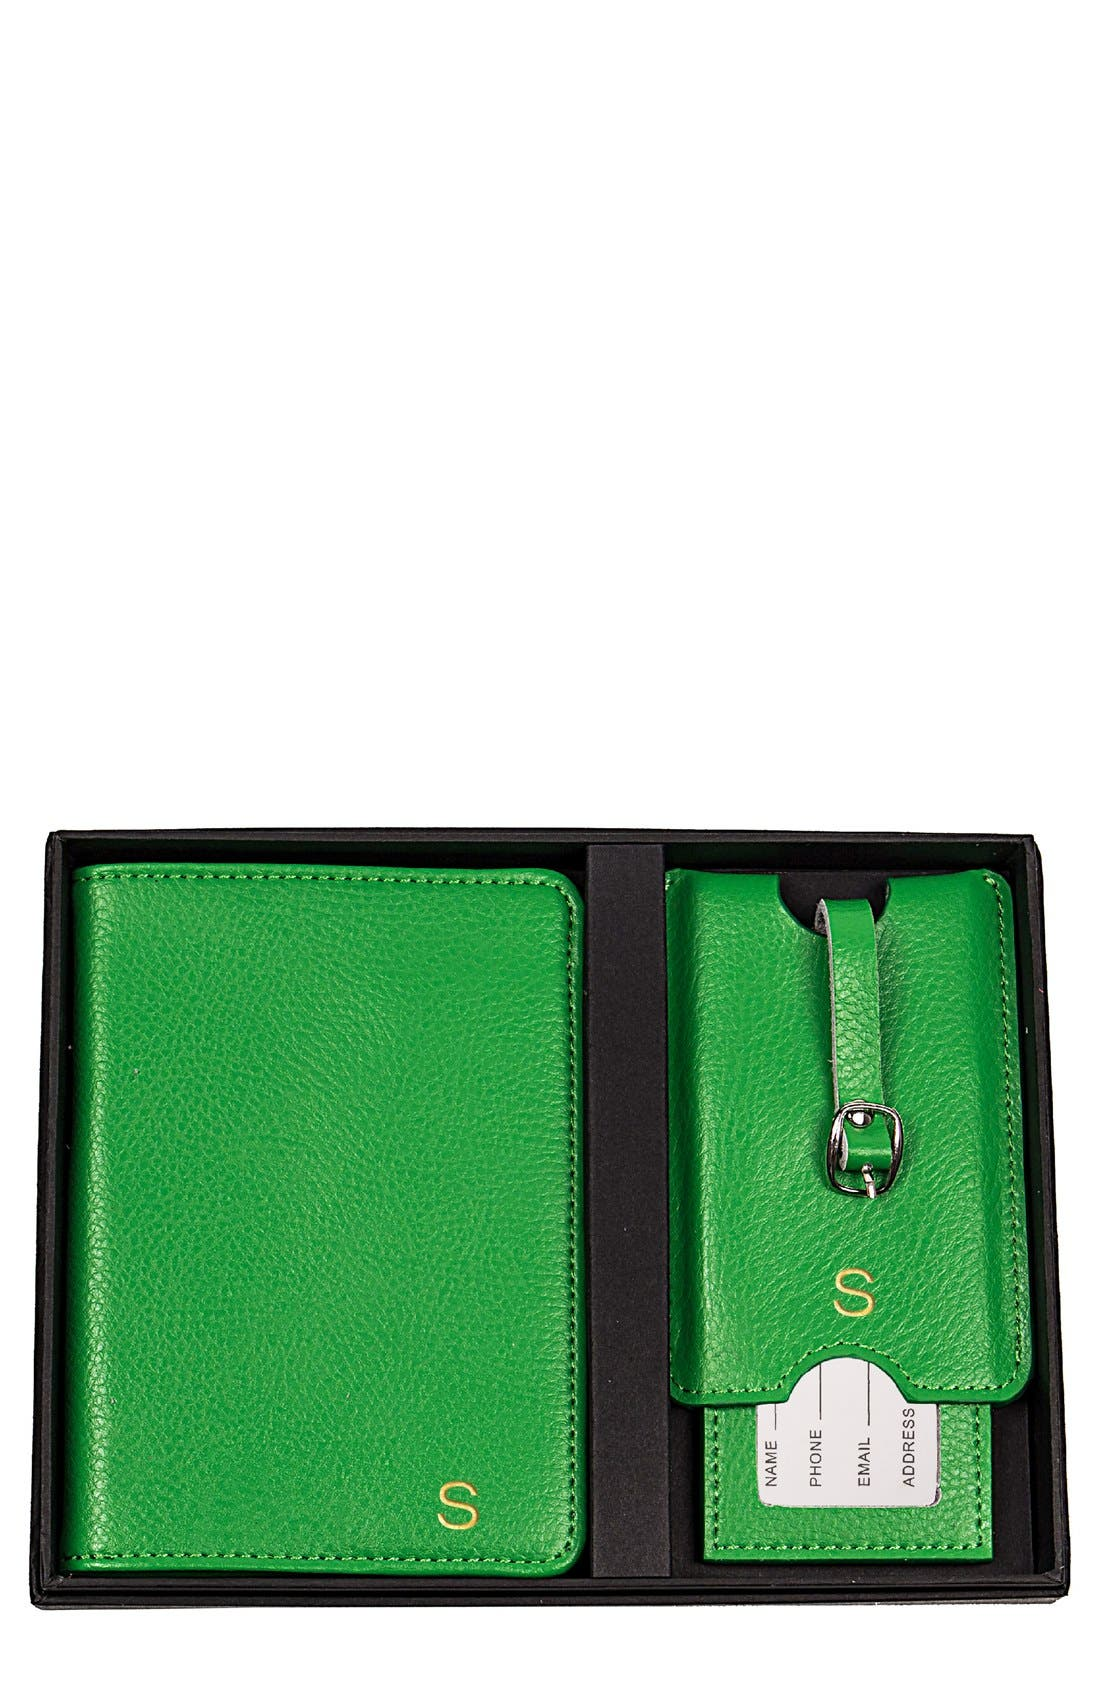 Monogram Passport Case & Luggage Tag,                         Main,                         color, Green - S